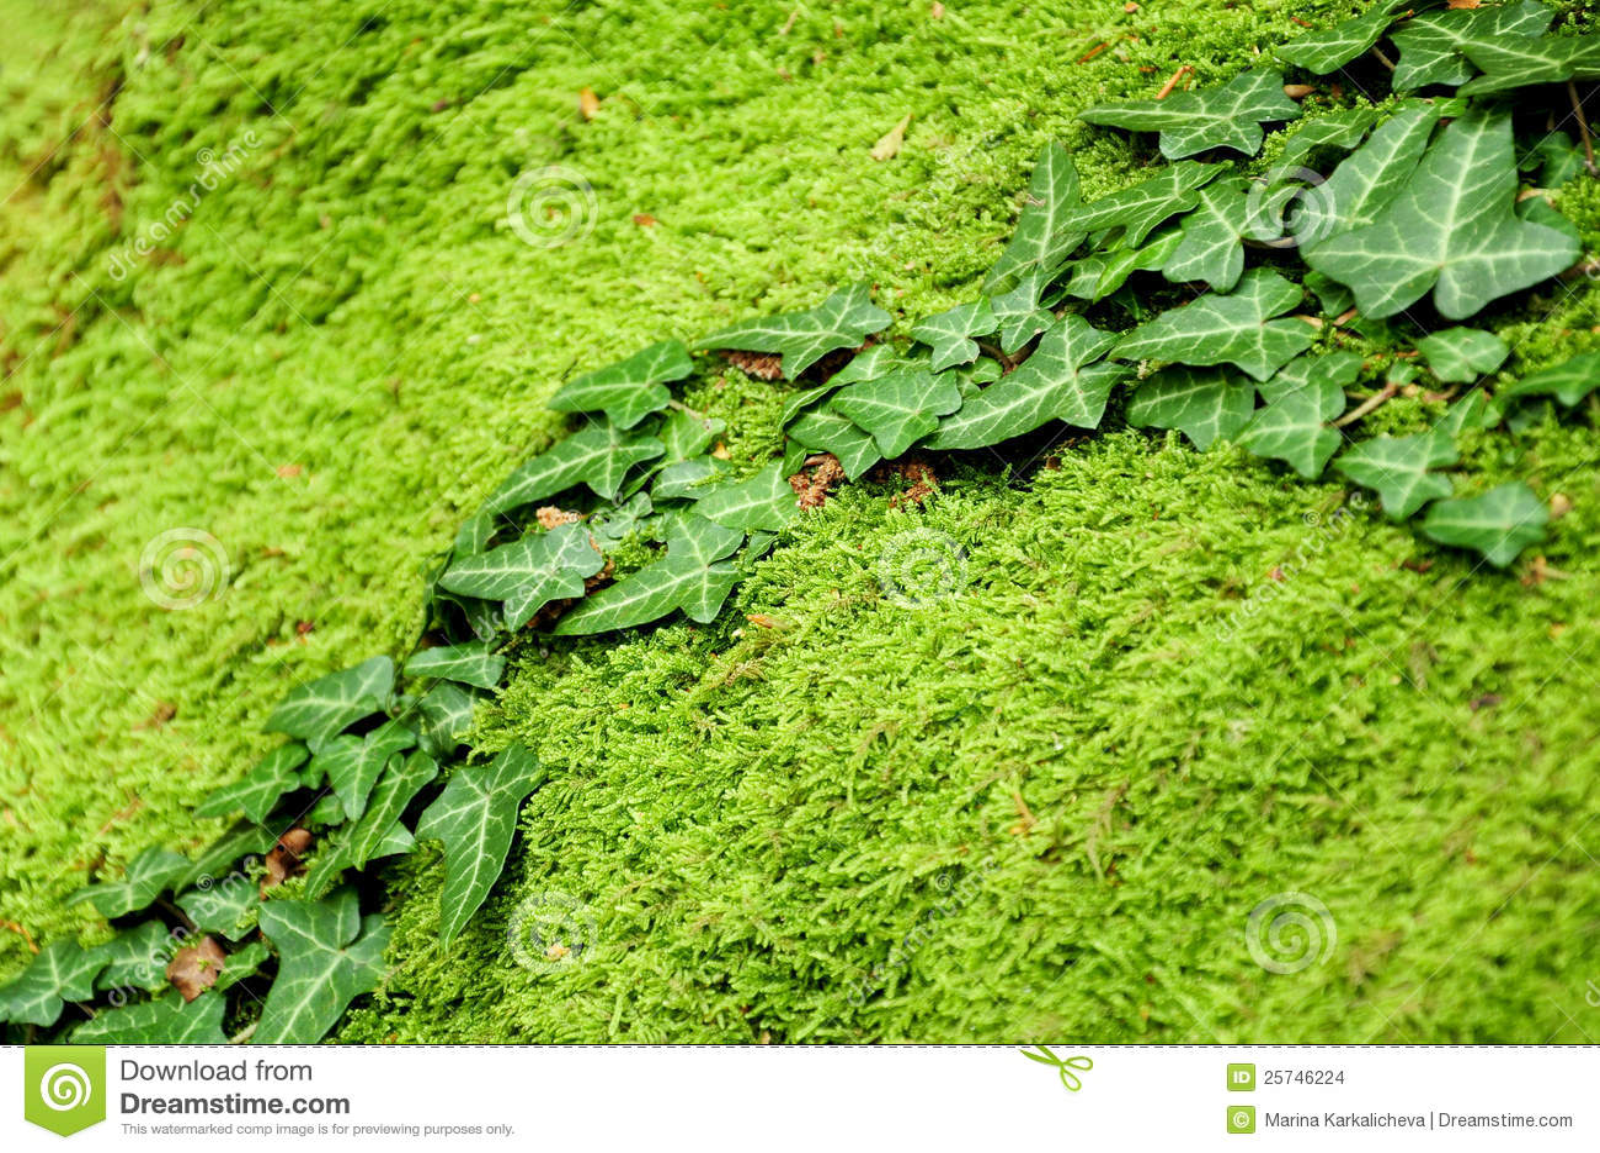 Ivy on mossy stone